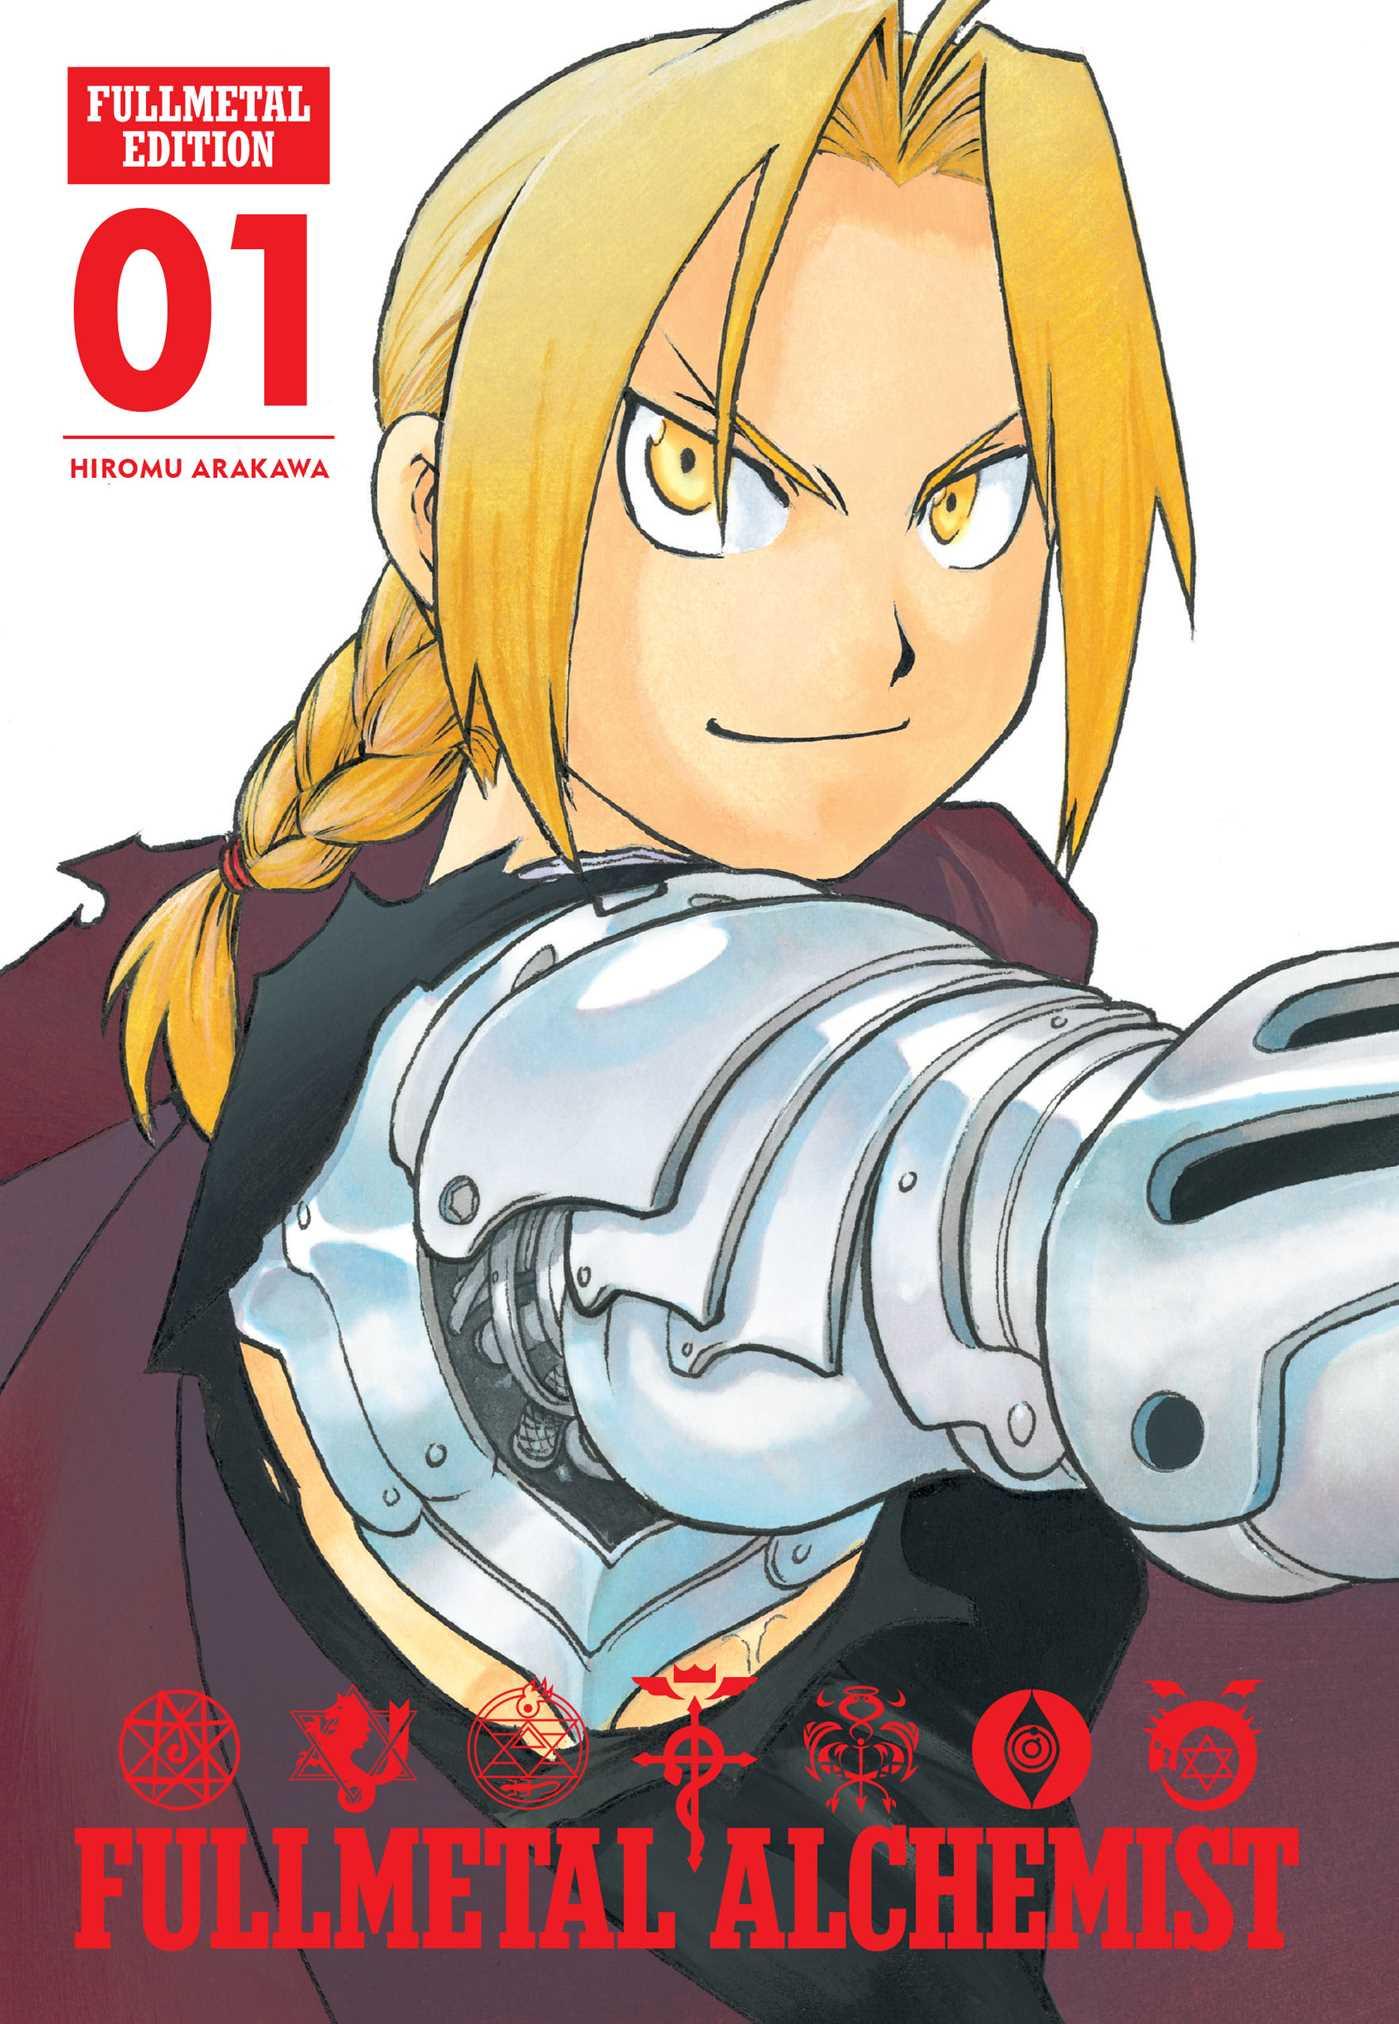 Fullmetal alchemist fullmetal edition vol 1 9781421599779 hr